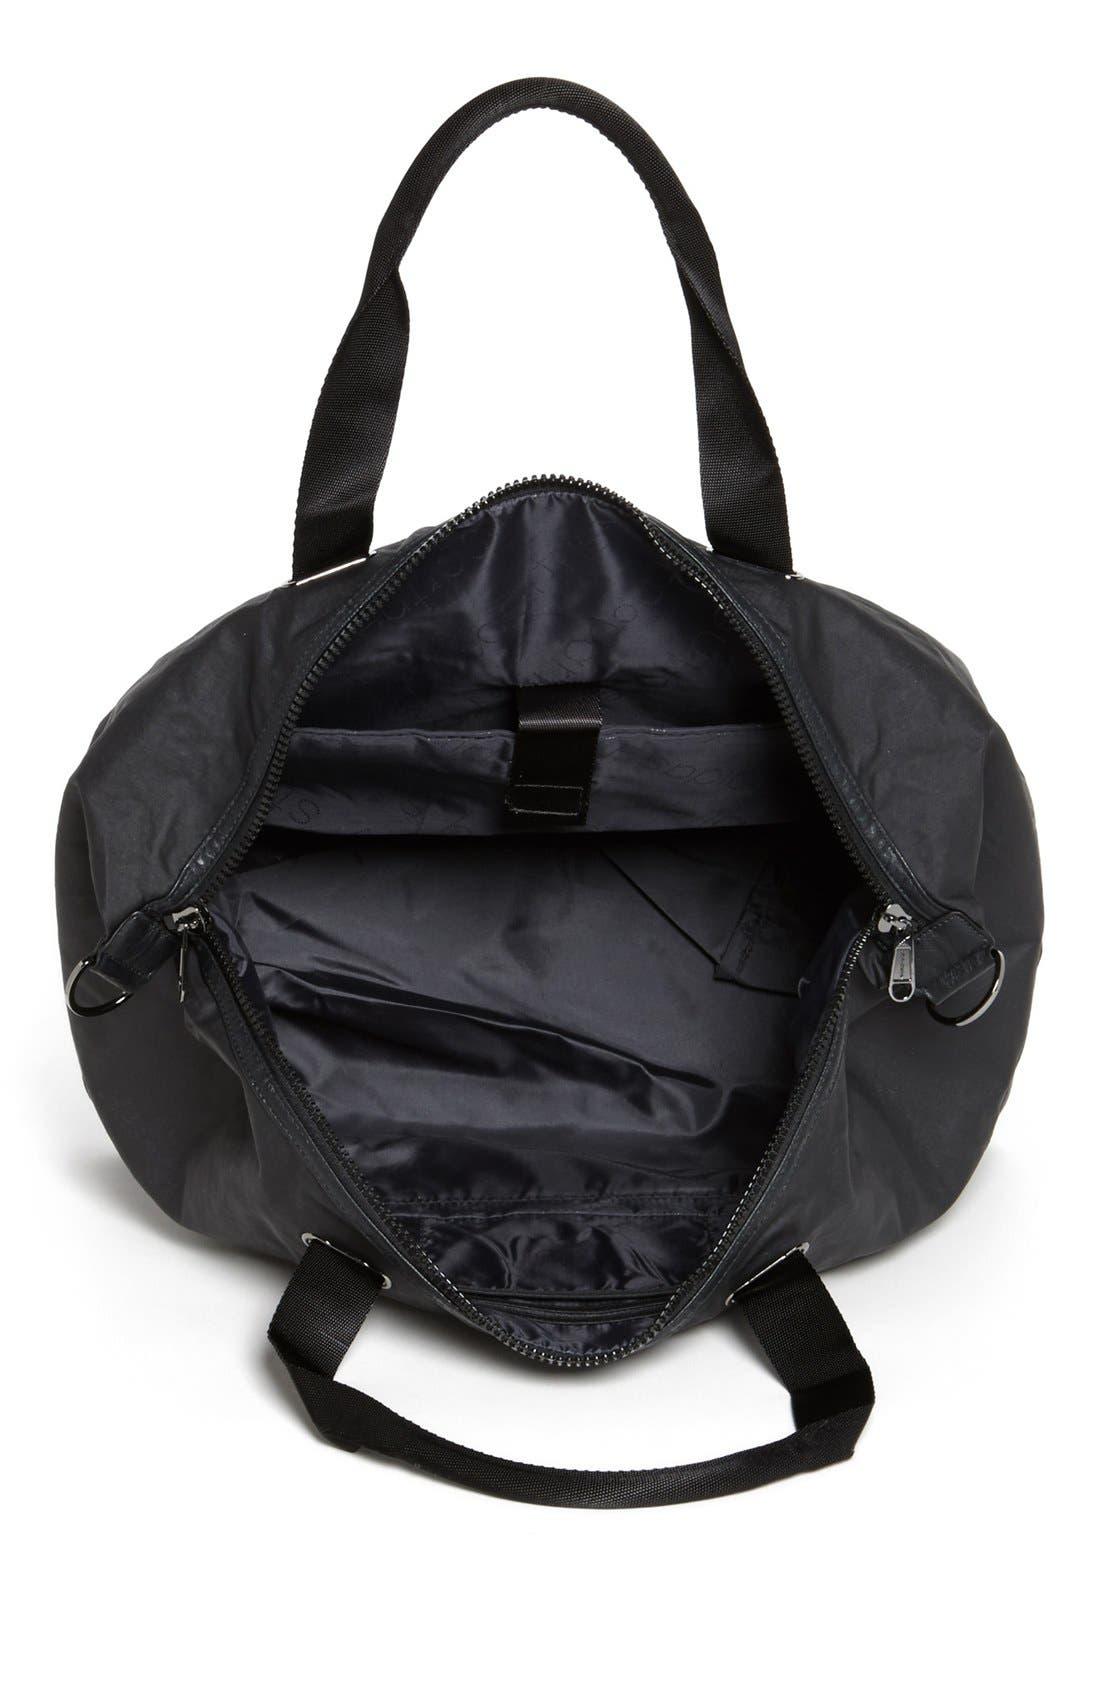 Alternate Image 3  - adidas by Stella McCartney 'Big' Bag